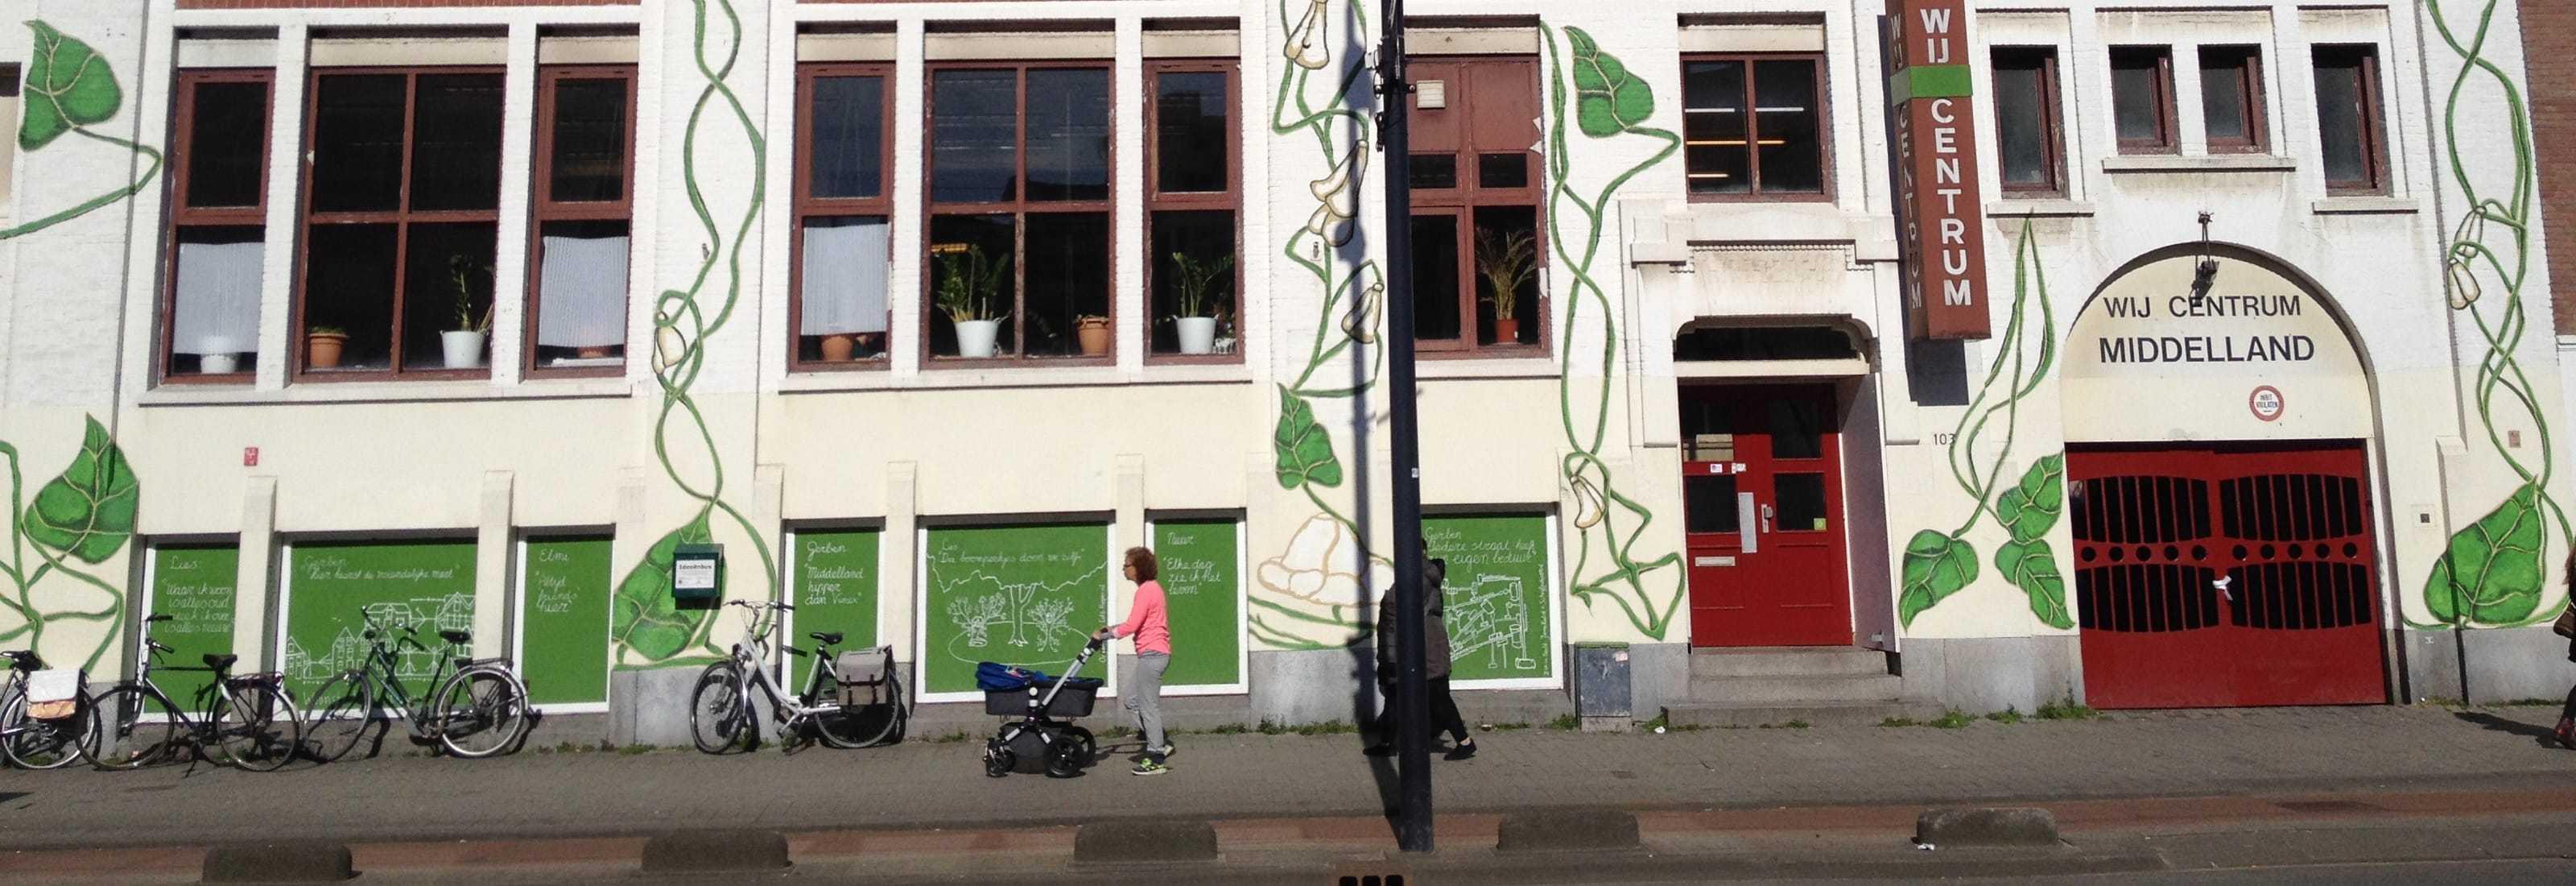 Fiducie - Administratiekantoor in Rotterdam